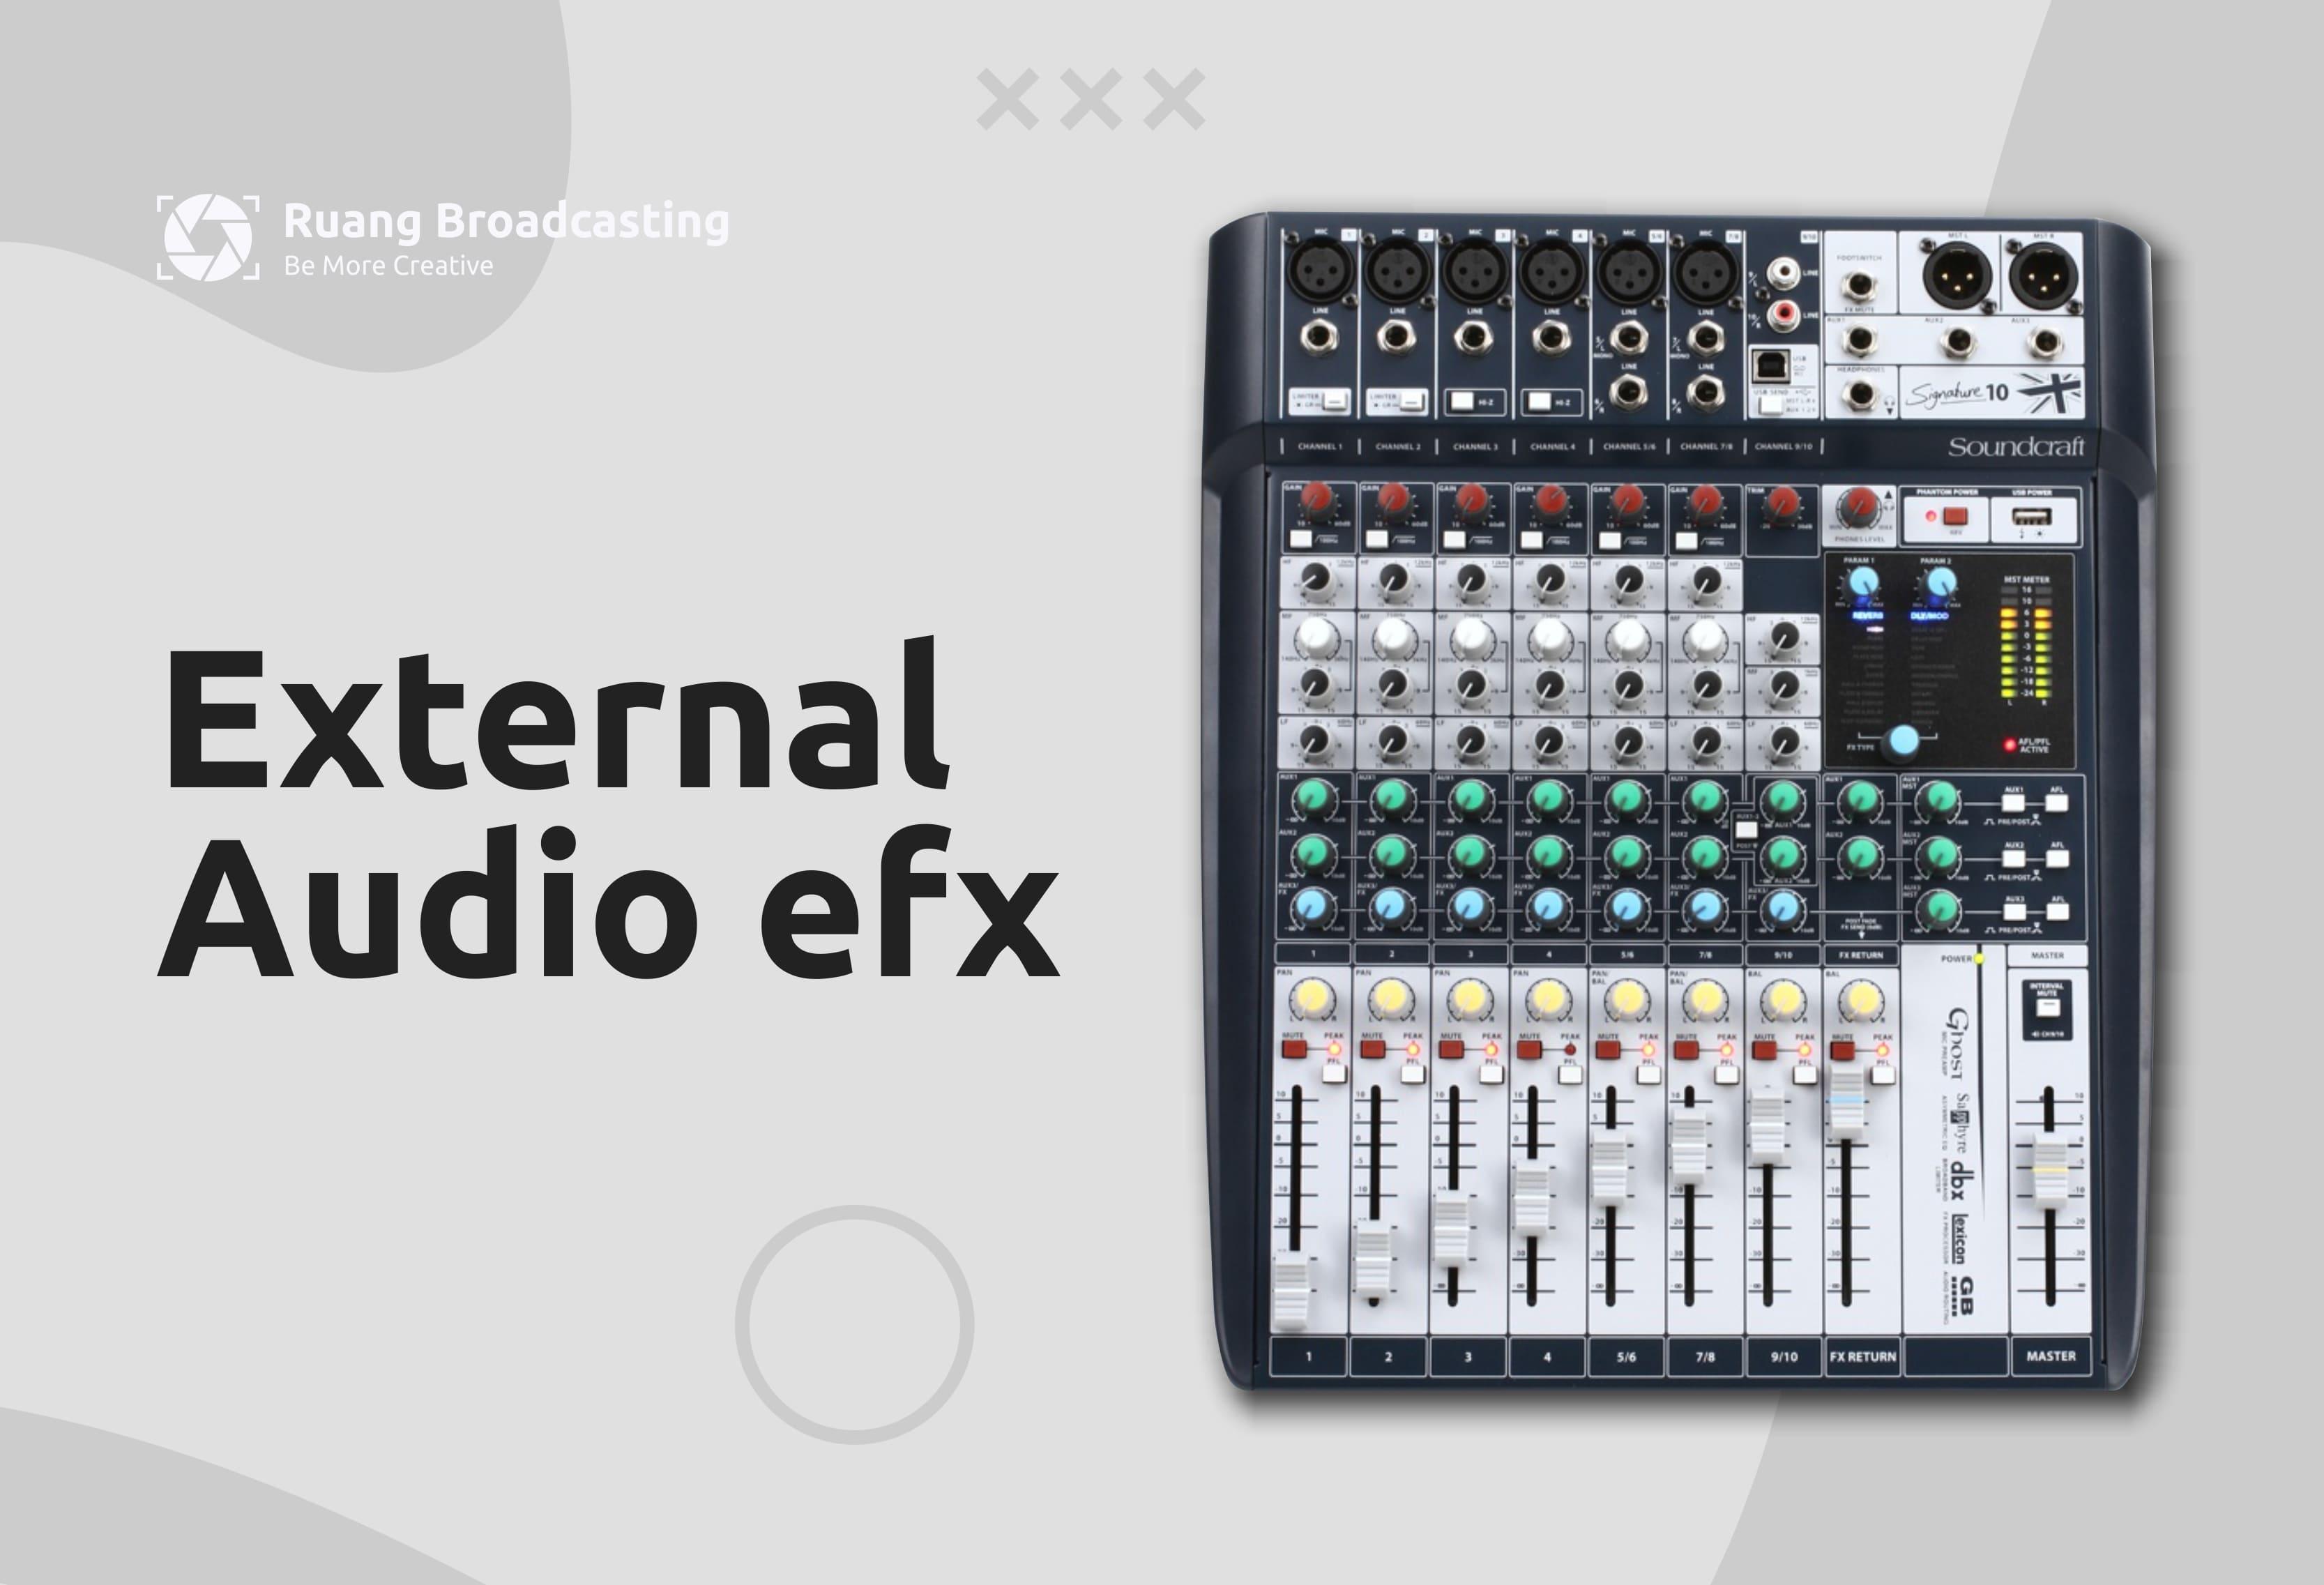 External Audio efx